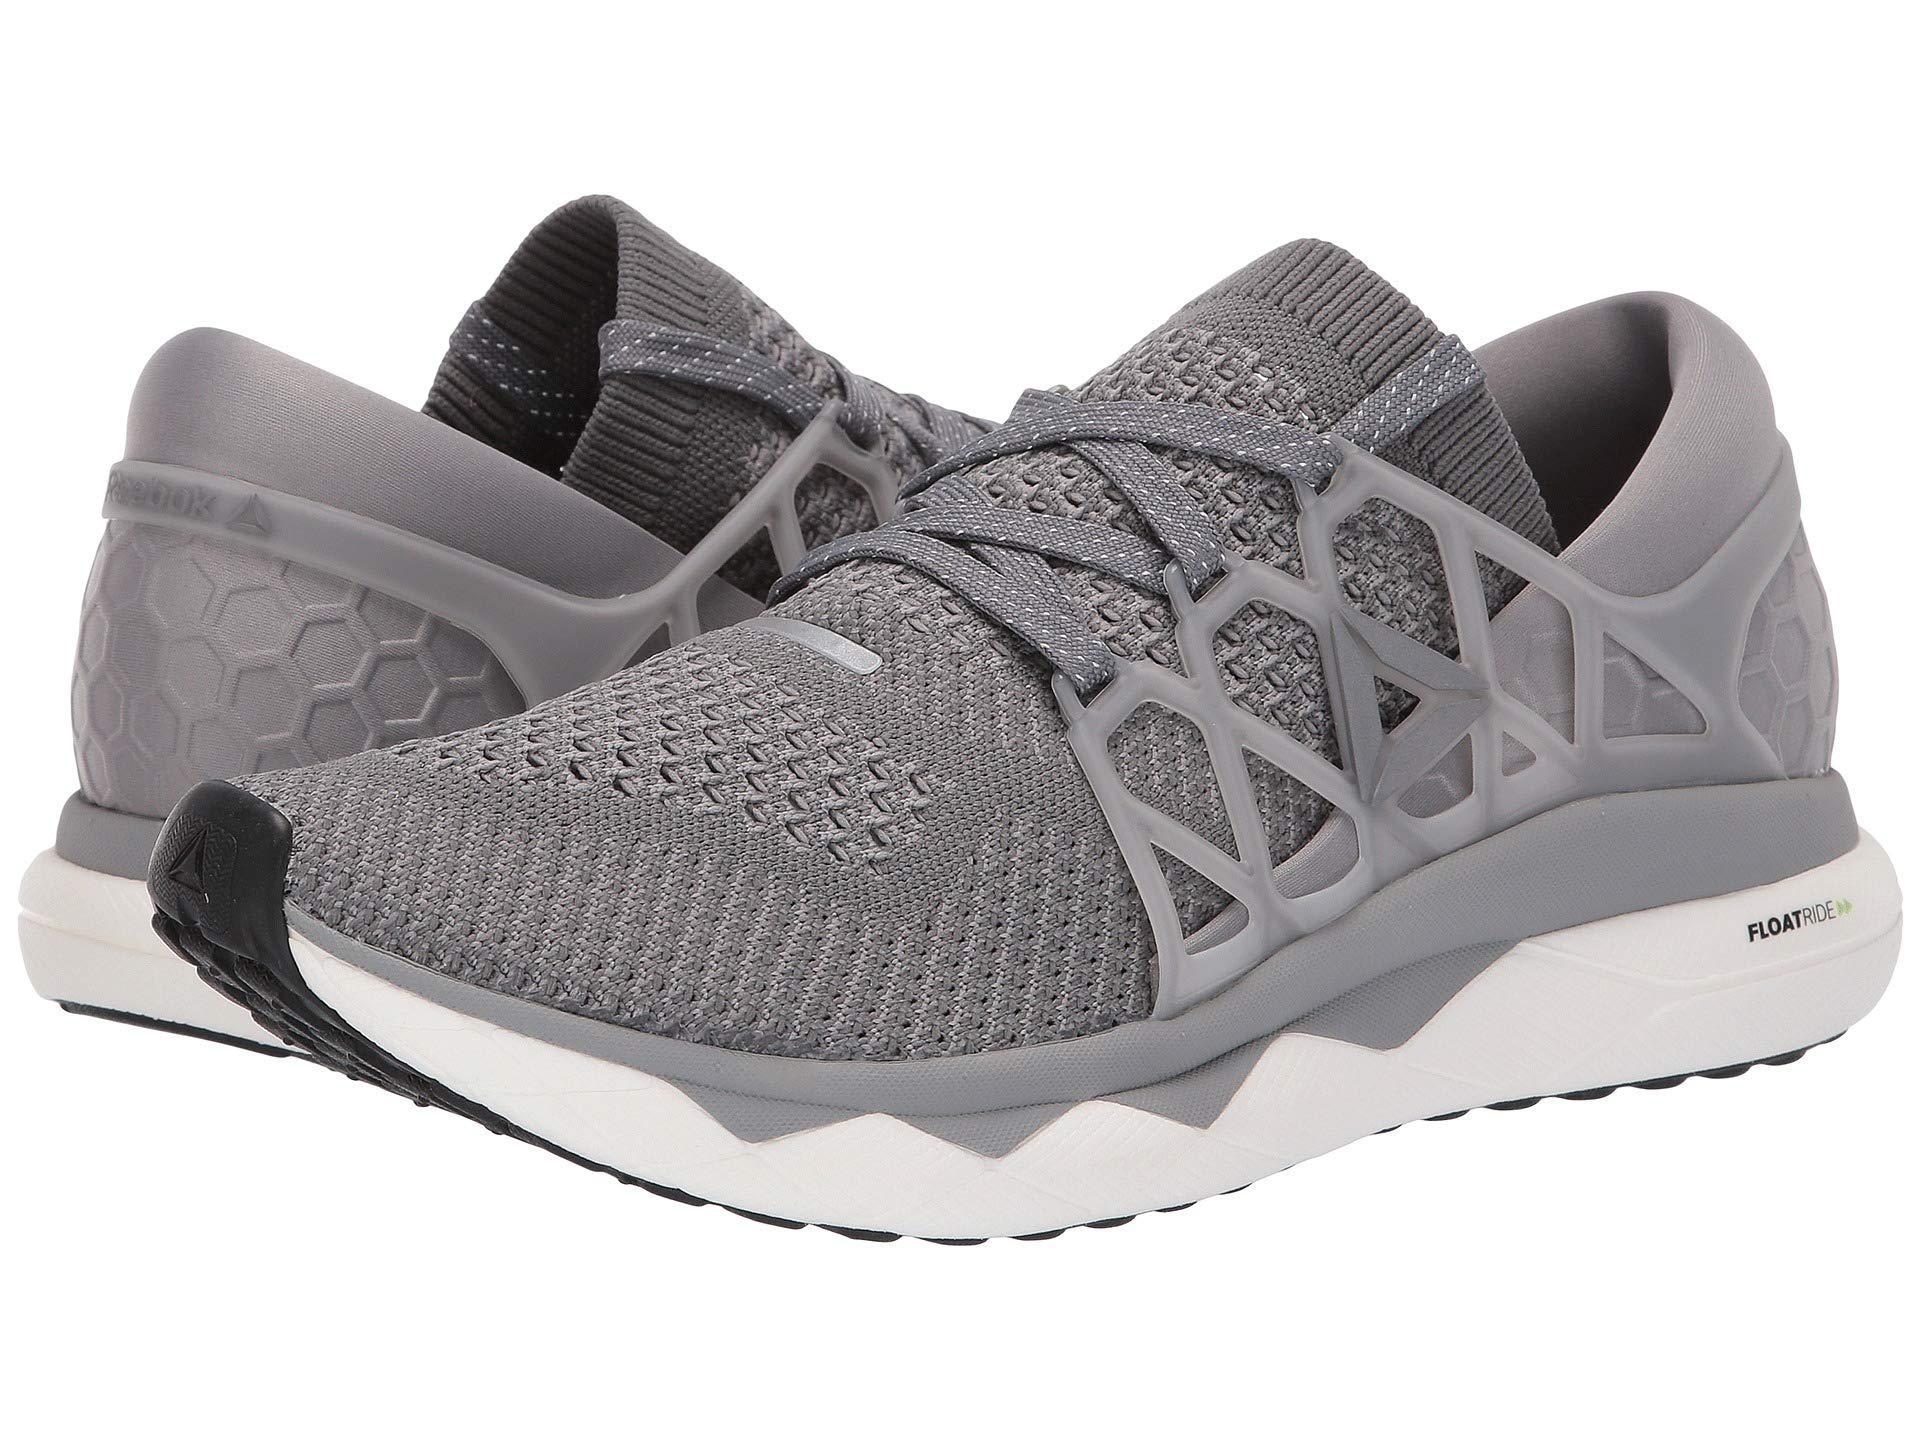 b02a194eacce96 Reebok. Gray Floatride Run Ultk (black gravel white) Men s Running Shoes